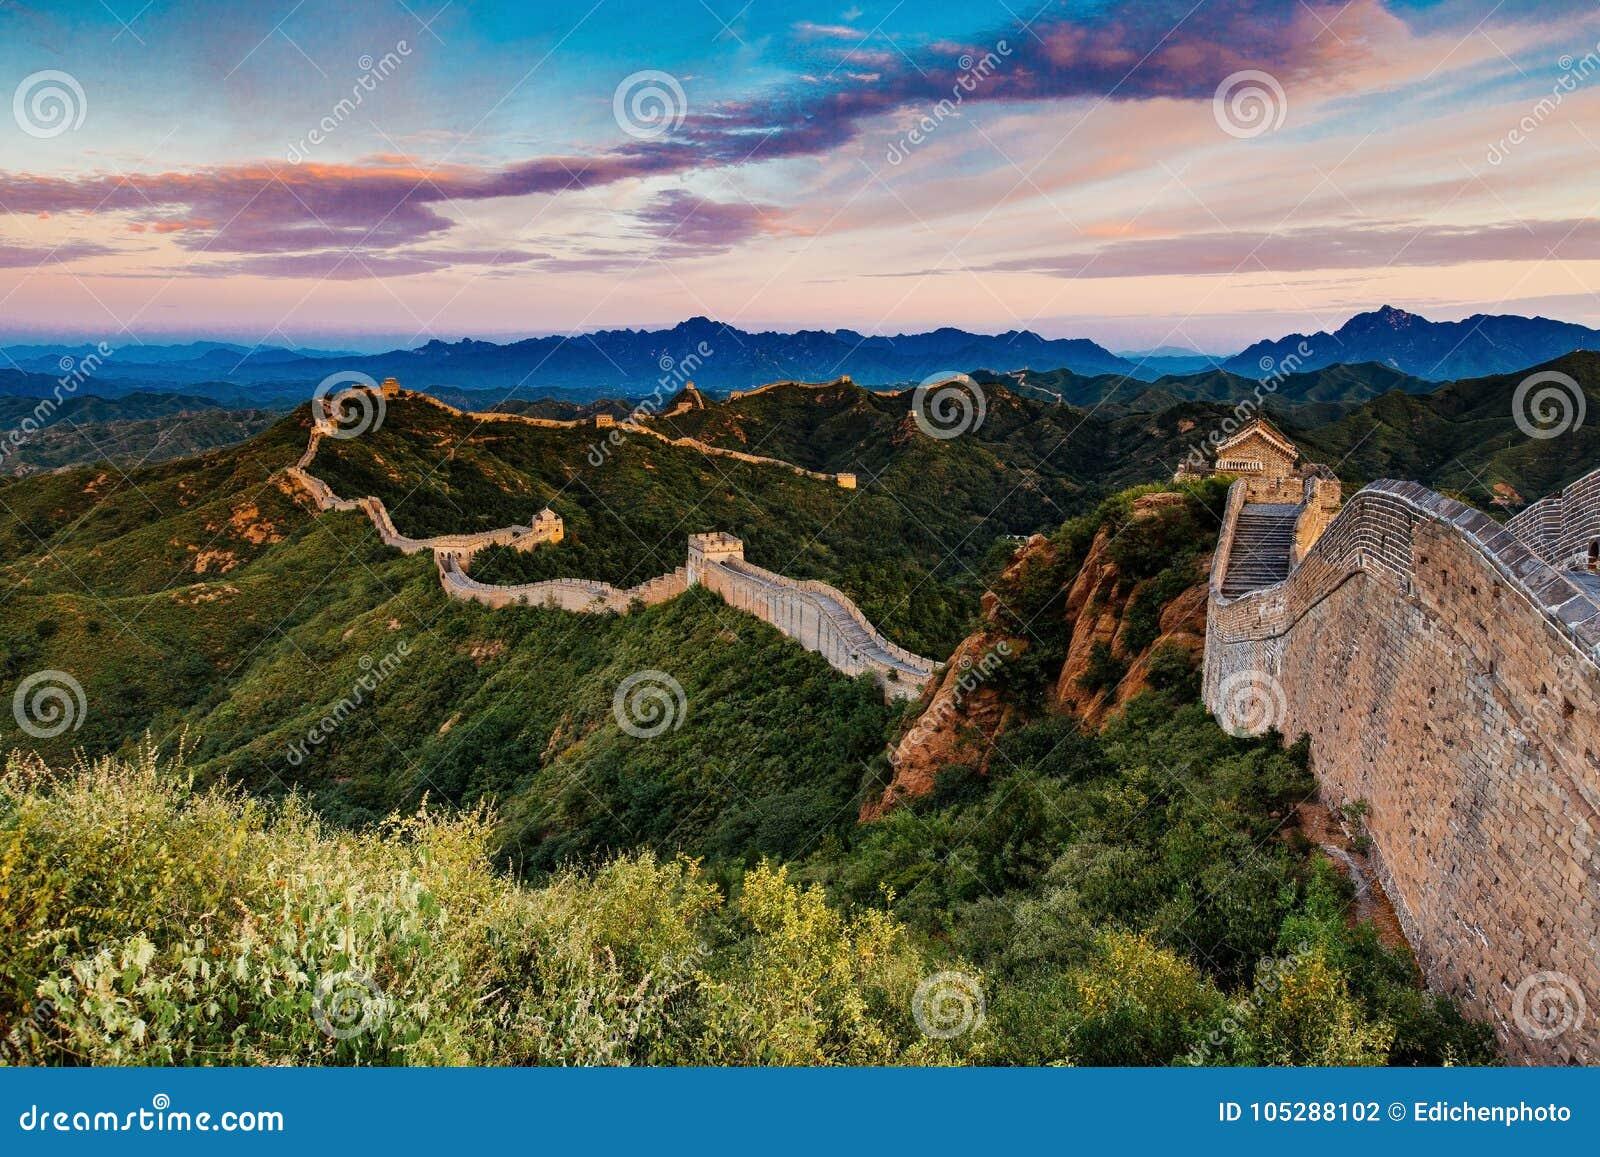 Peking, China - 12 augustus, 2014: Zonsopgang bij de Grote Muur van Jinshanling